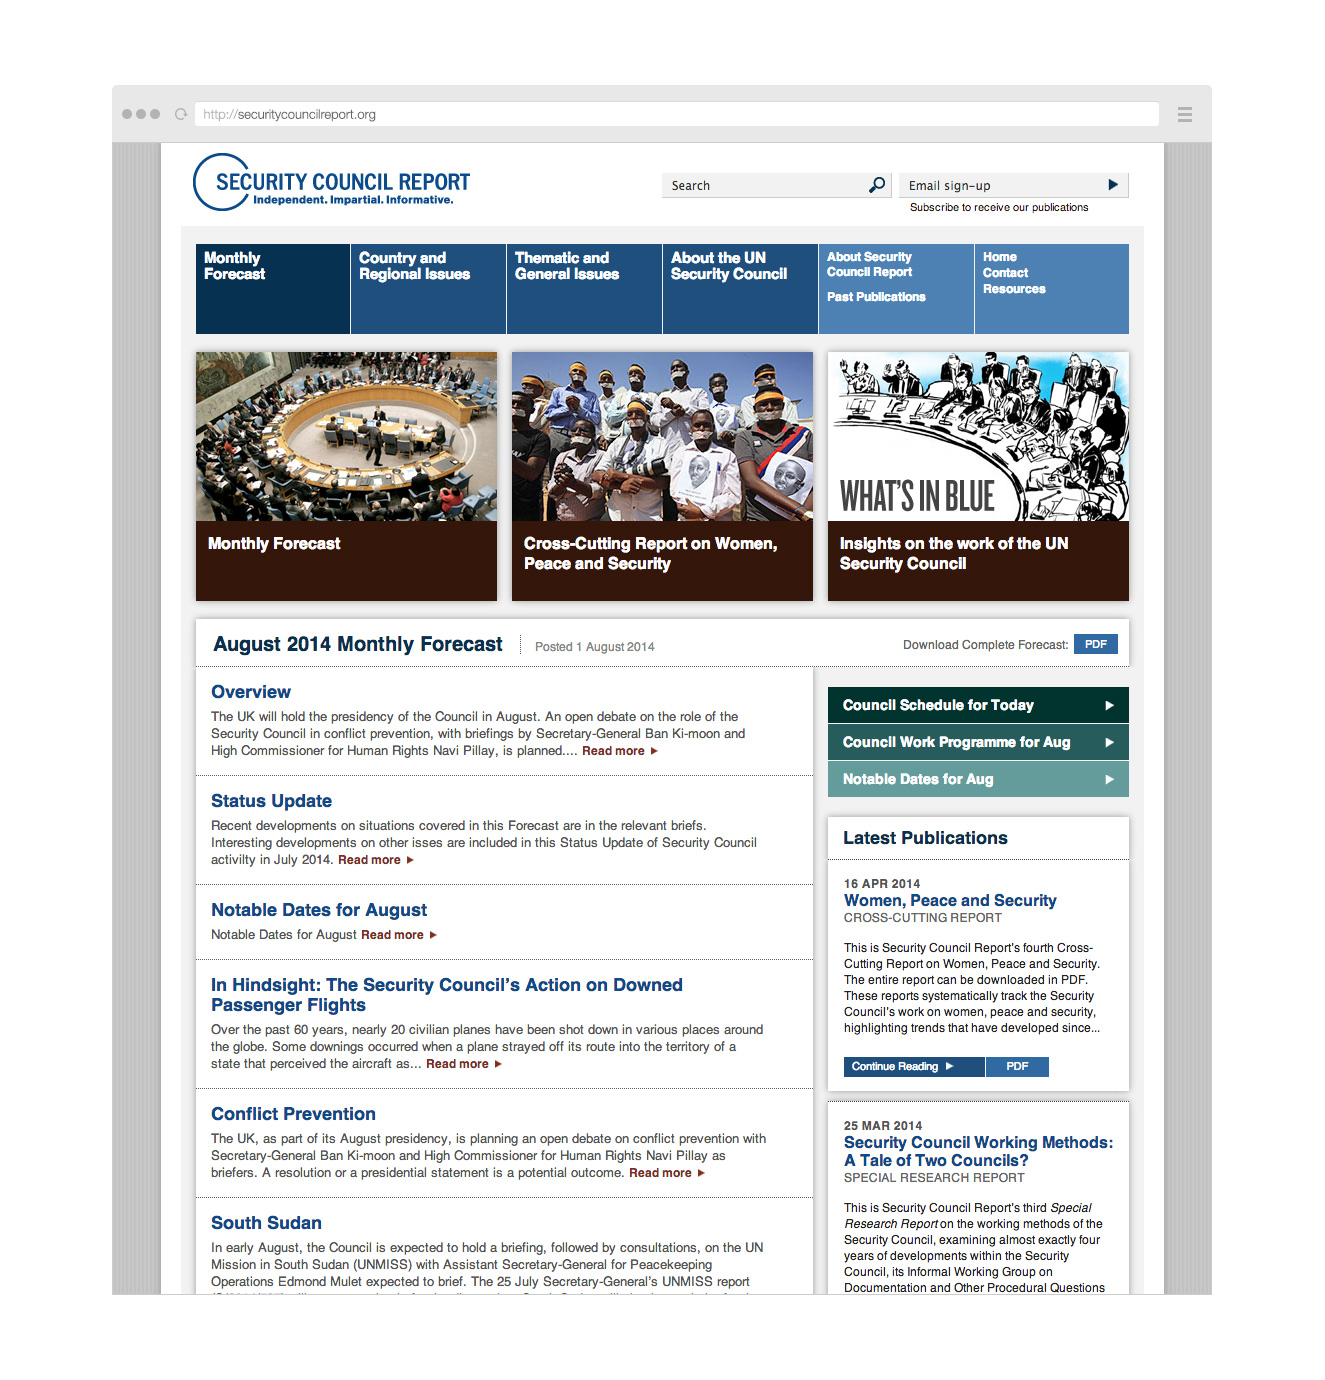 Security Council Report website